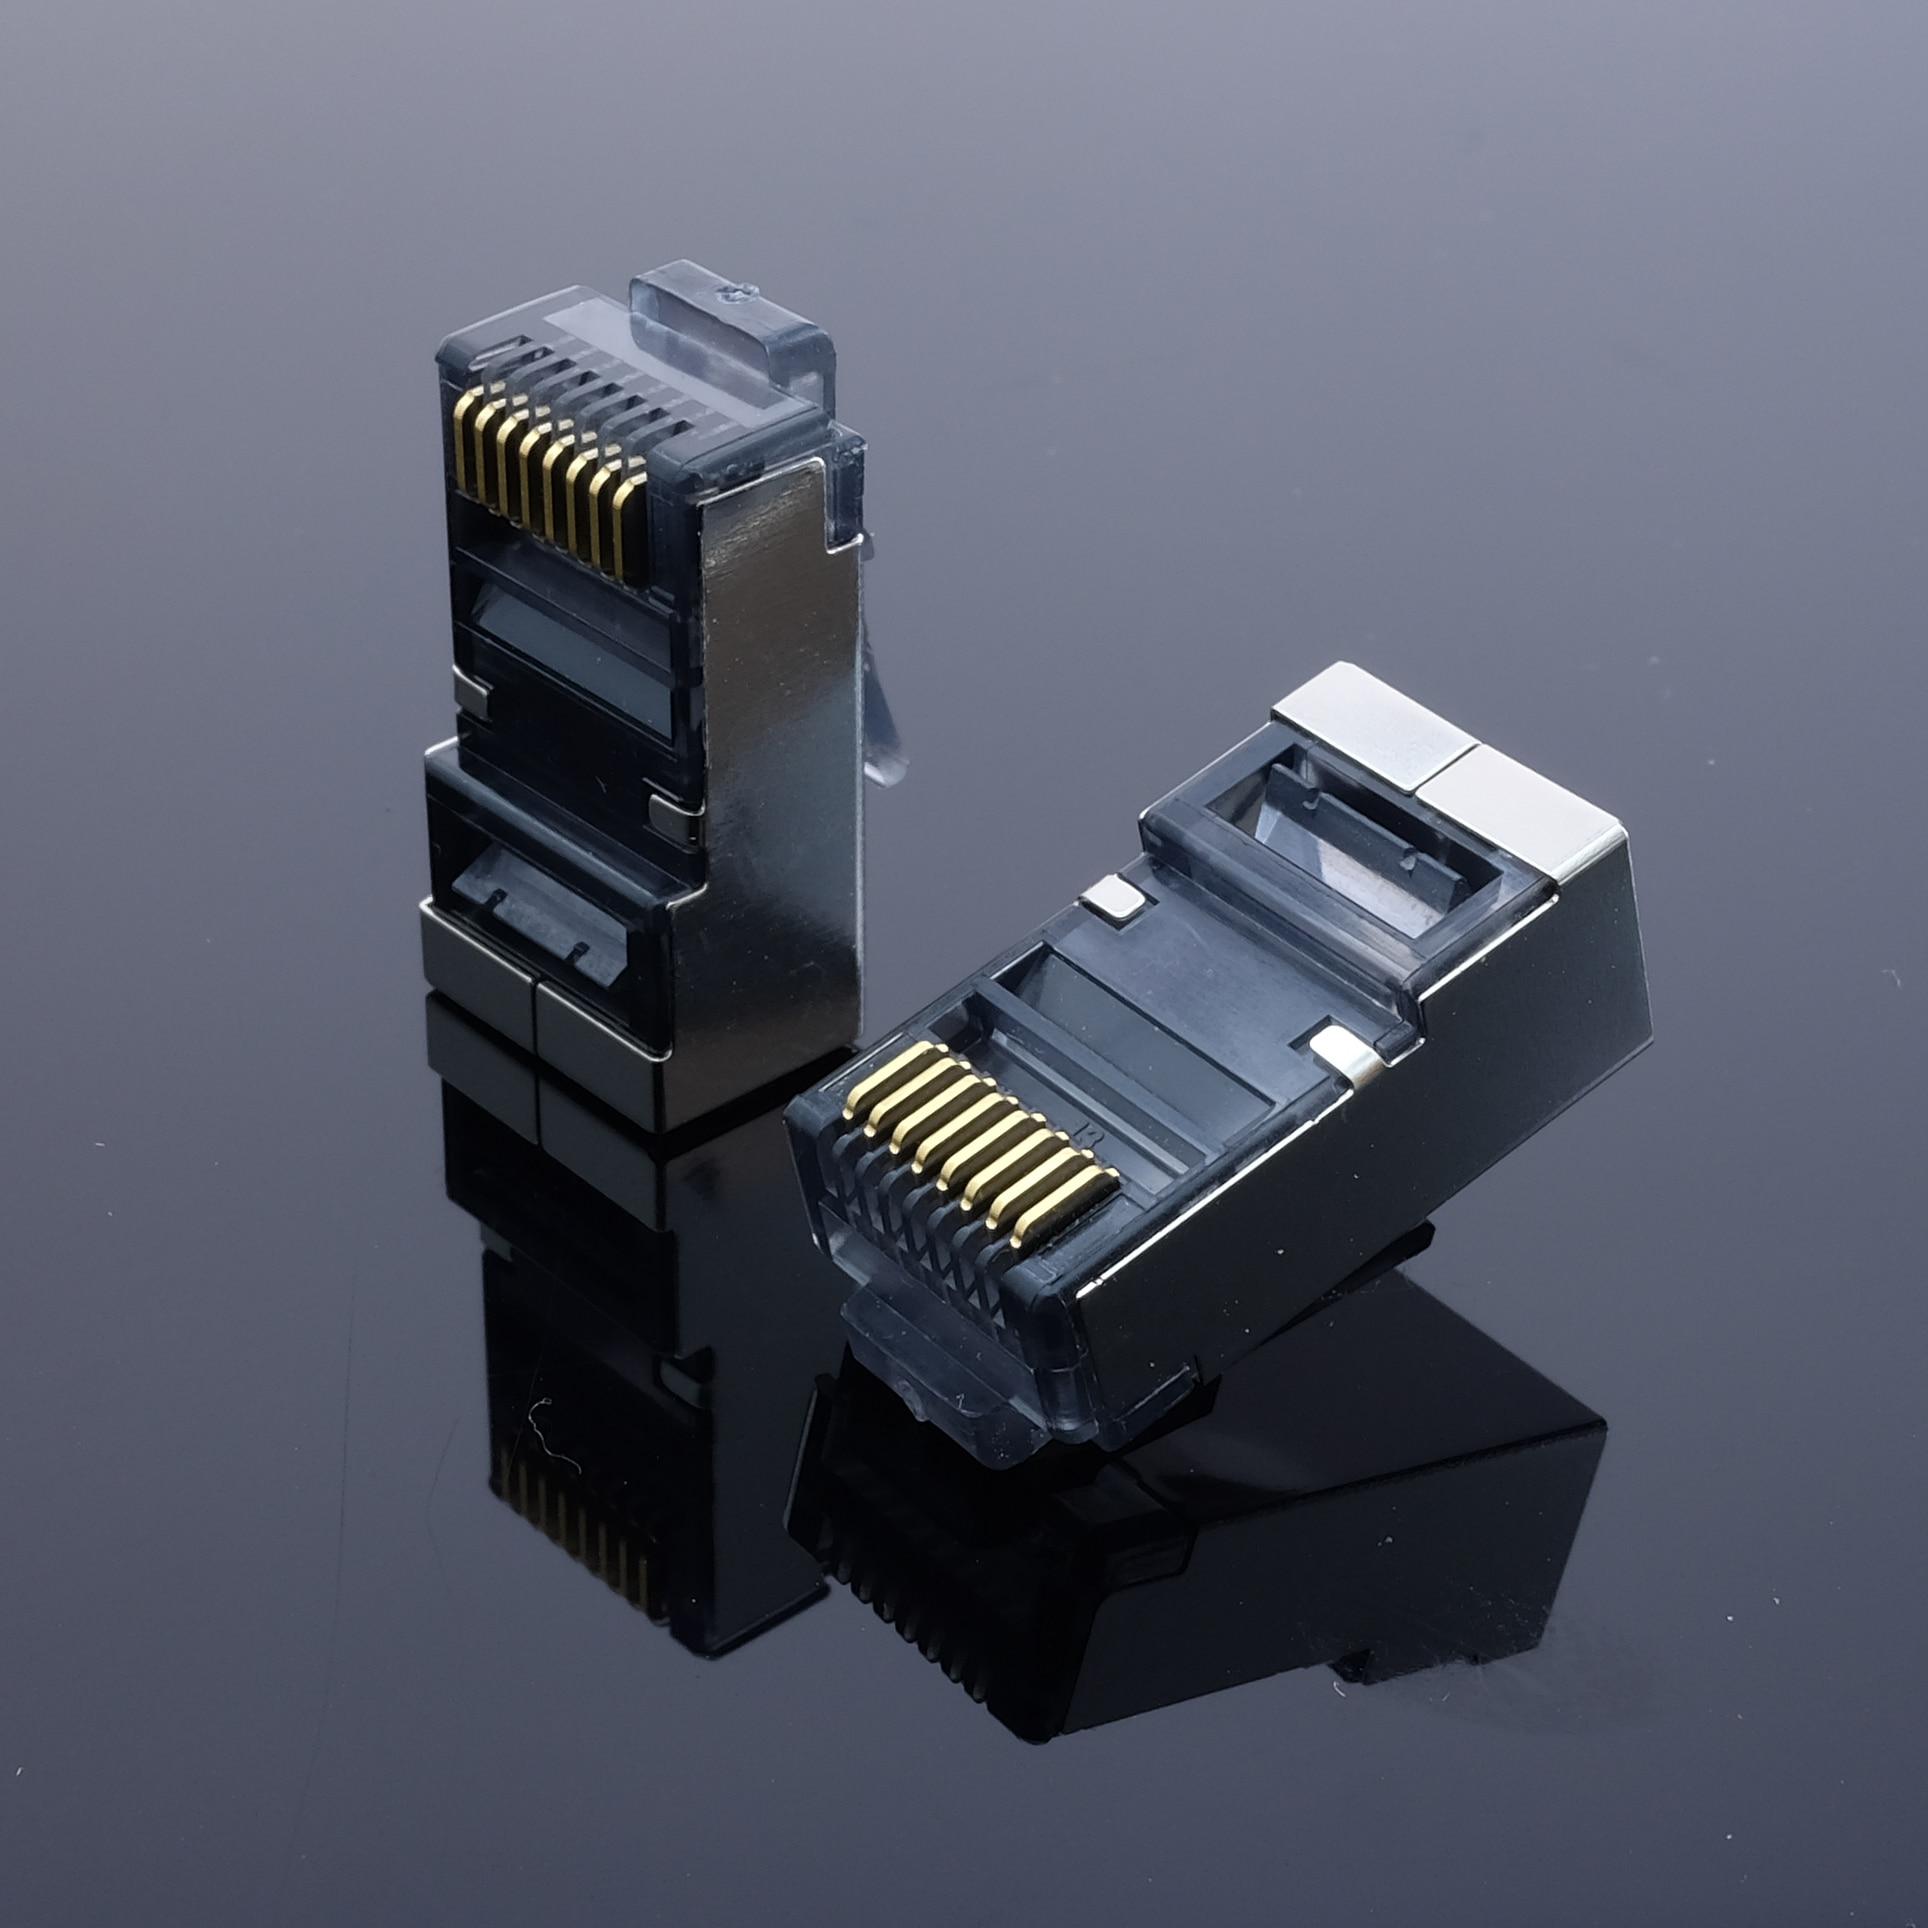 Купить с кэшбэком 50pcs Blue Cat 6 rj45 connector cat6 network connector rj45 plug split type 8P8C stp metal shielded modular terminals HY1532